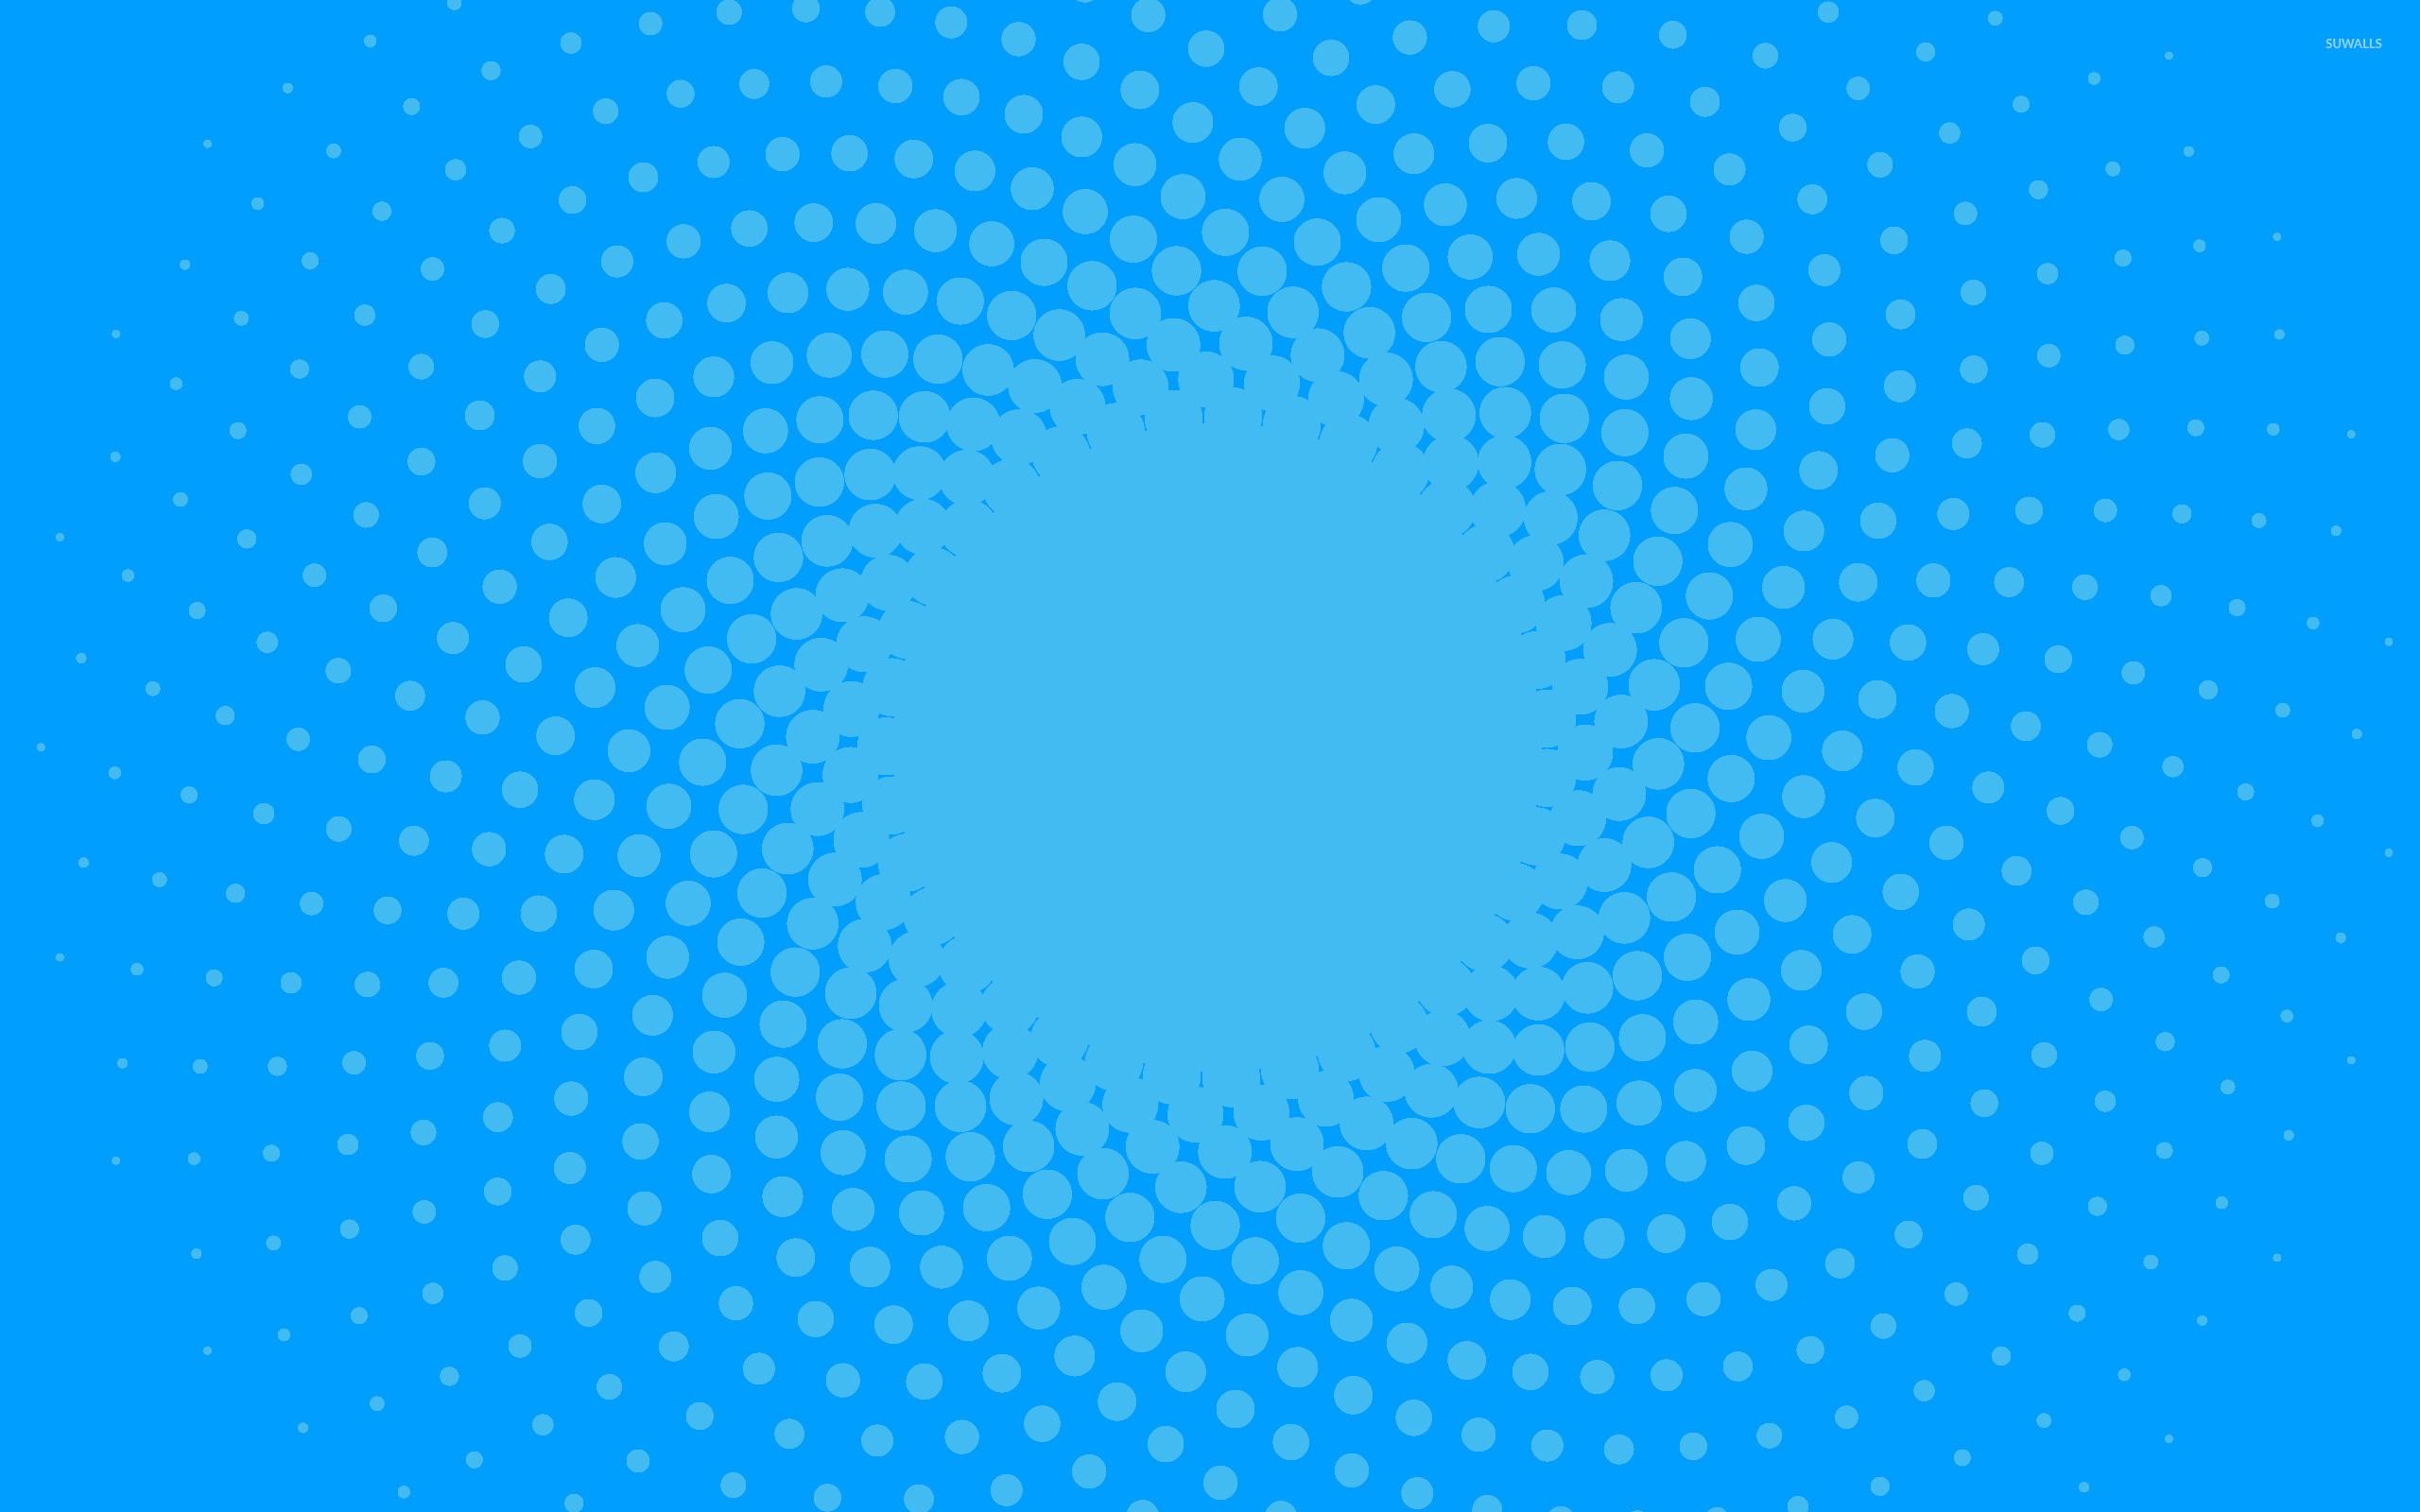 Blue circles wallpaper – Abstract wallpapers – #21552